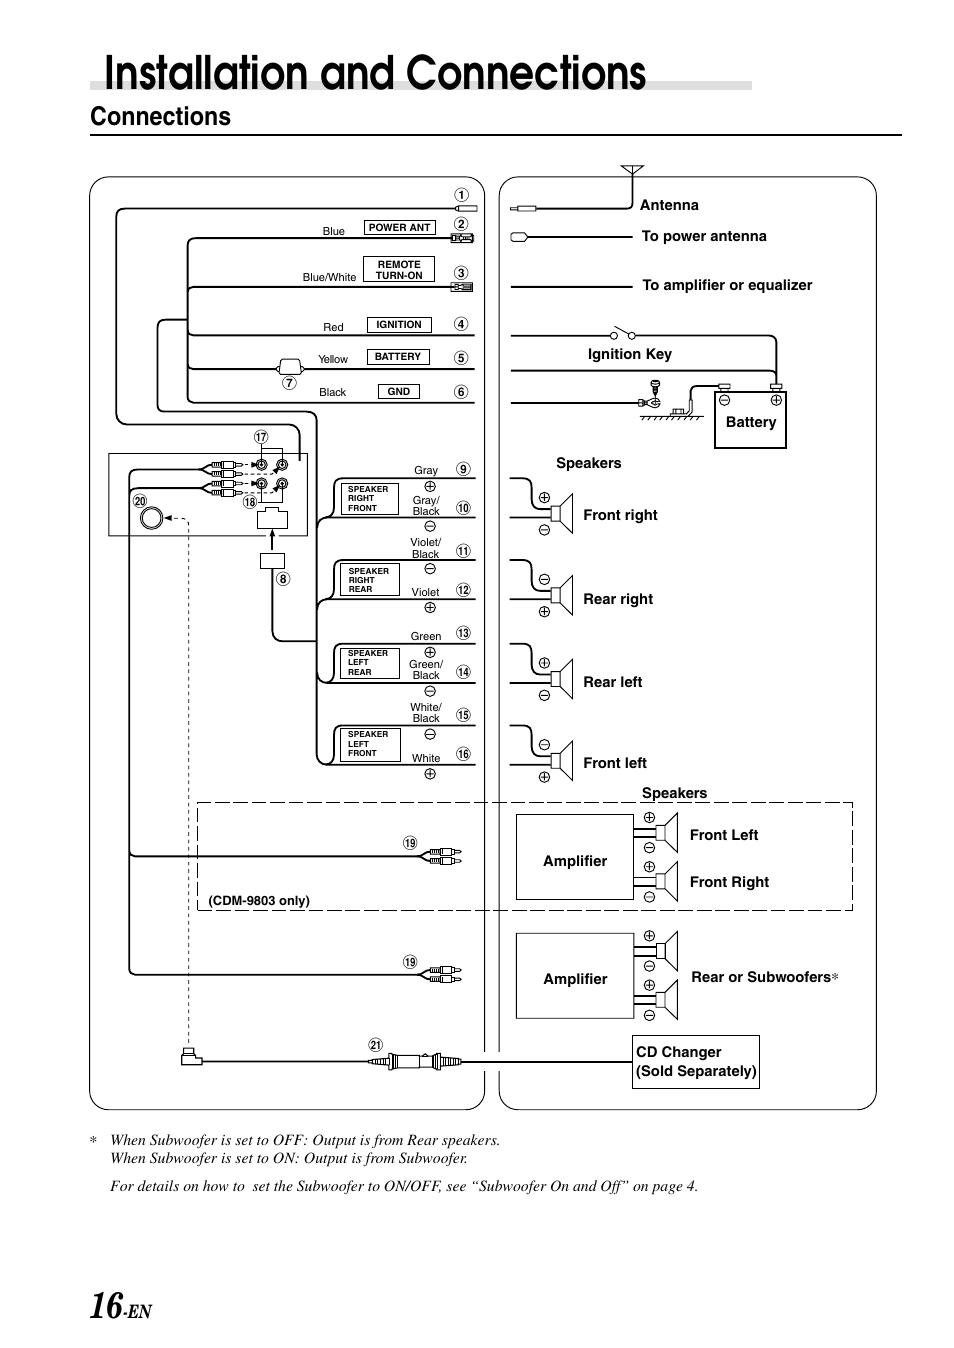 wiring installation and connections connections alpine cdm 9803 rh manualsdir com Alpine CD Player Alpine CDM 9821 Harness